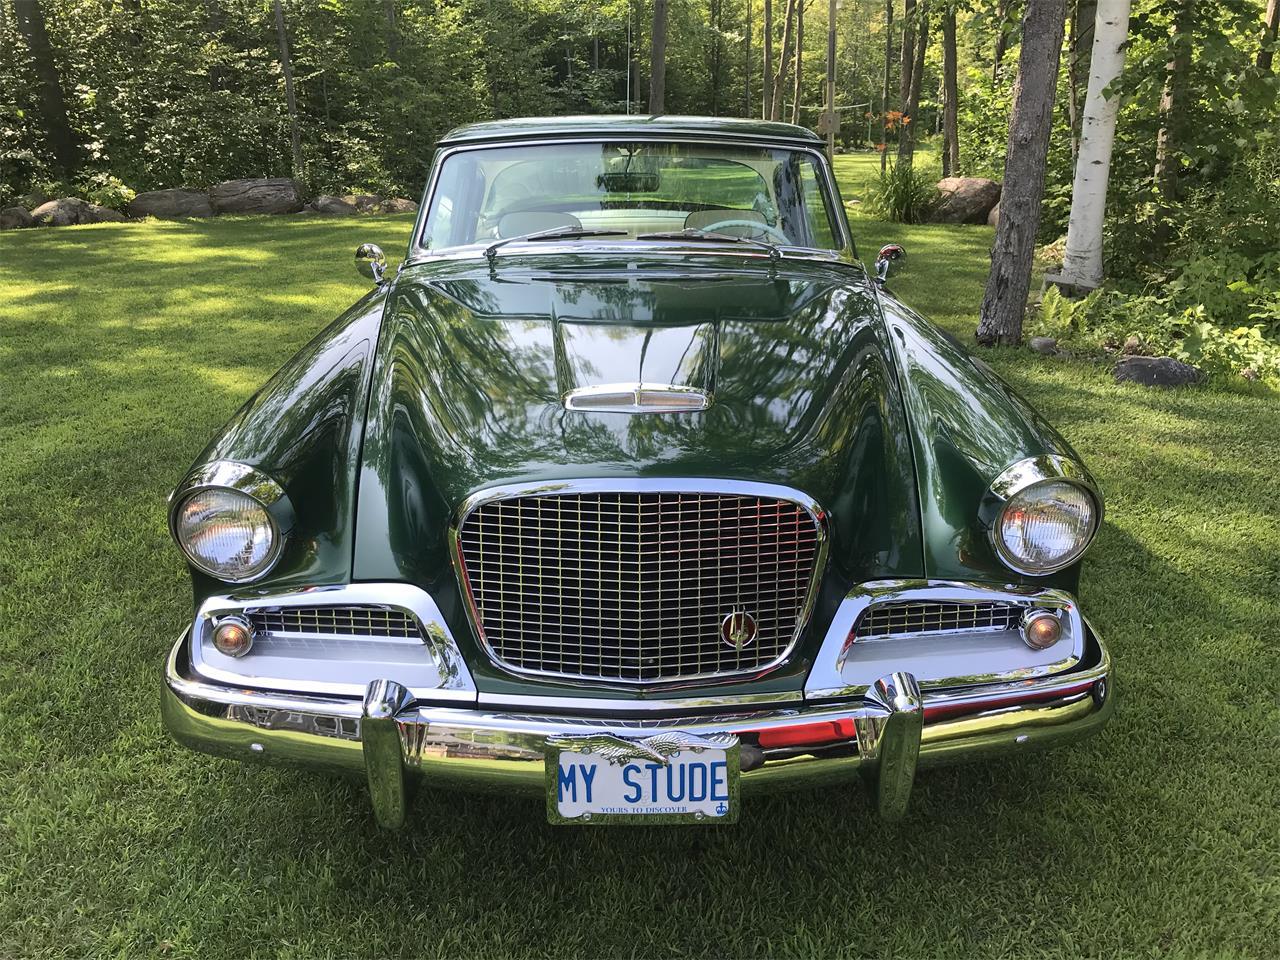 1961 Studebaker Hawk (CC-1229124) for sale in Waubaushene, Ontario